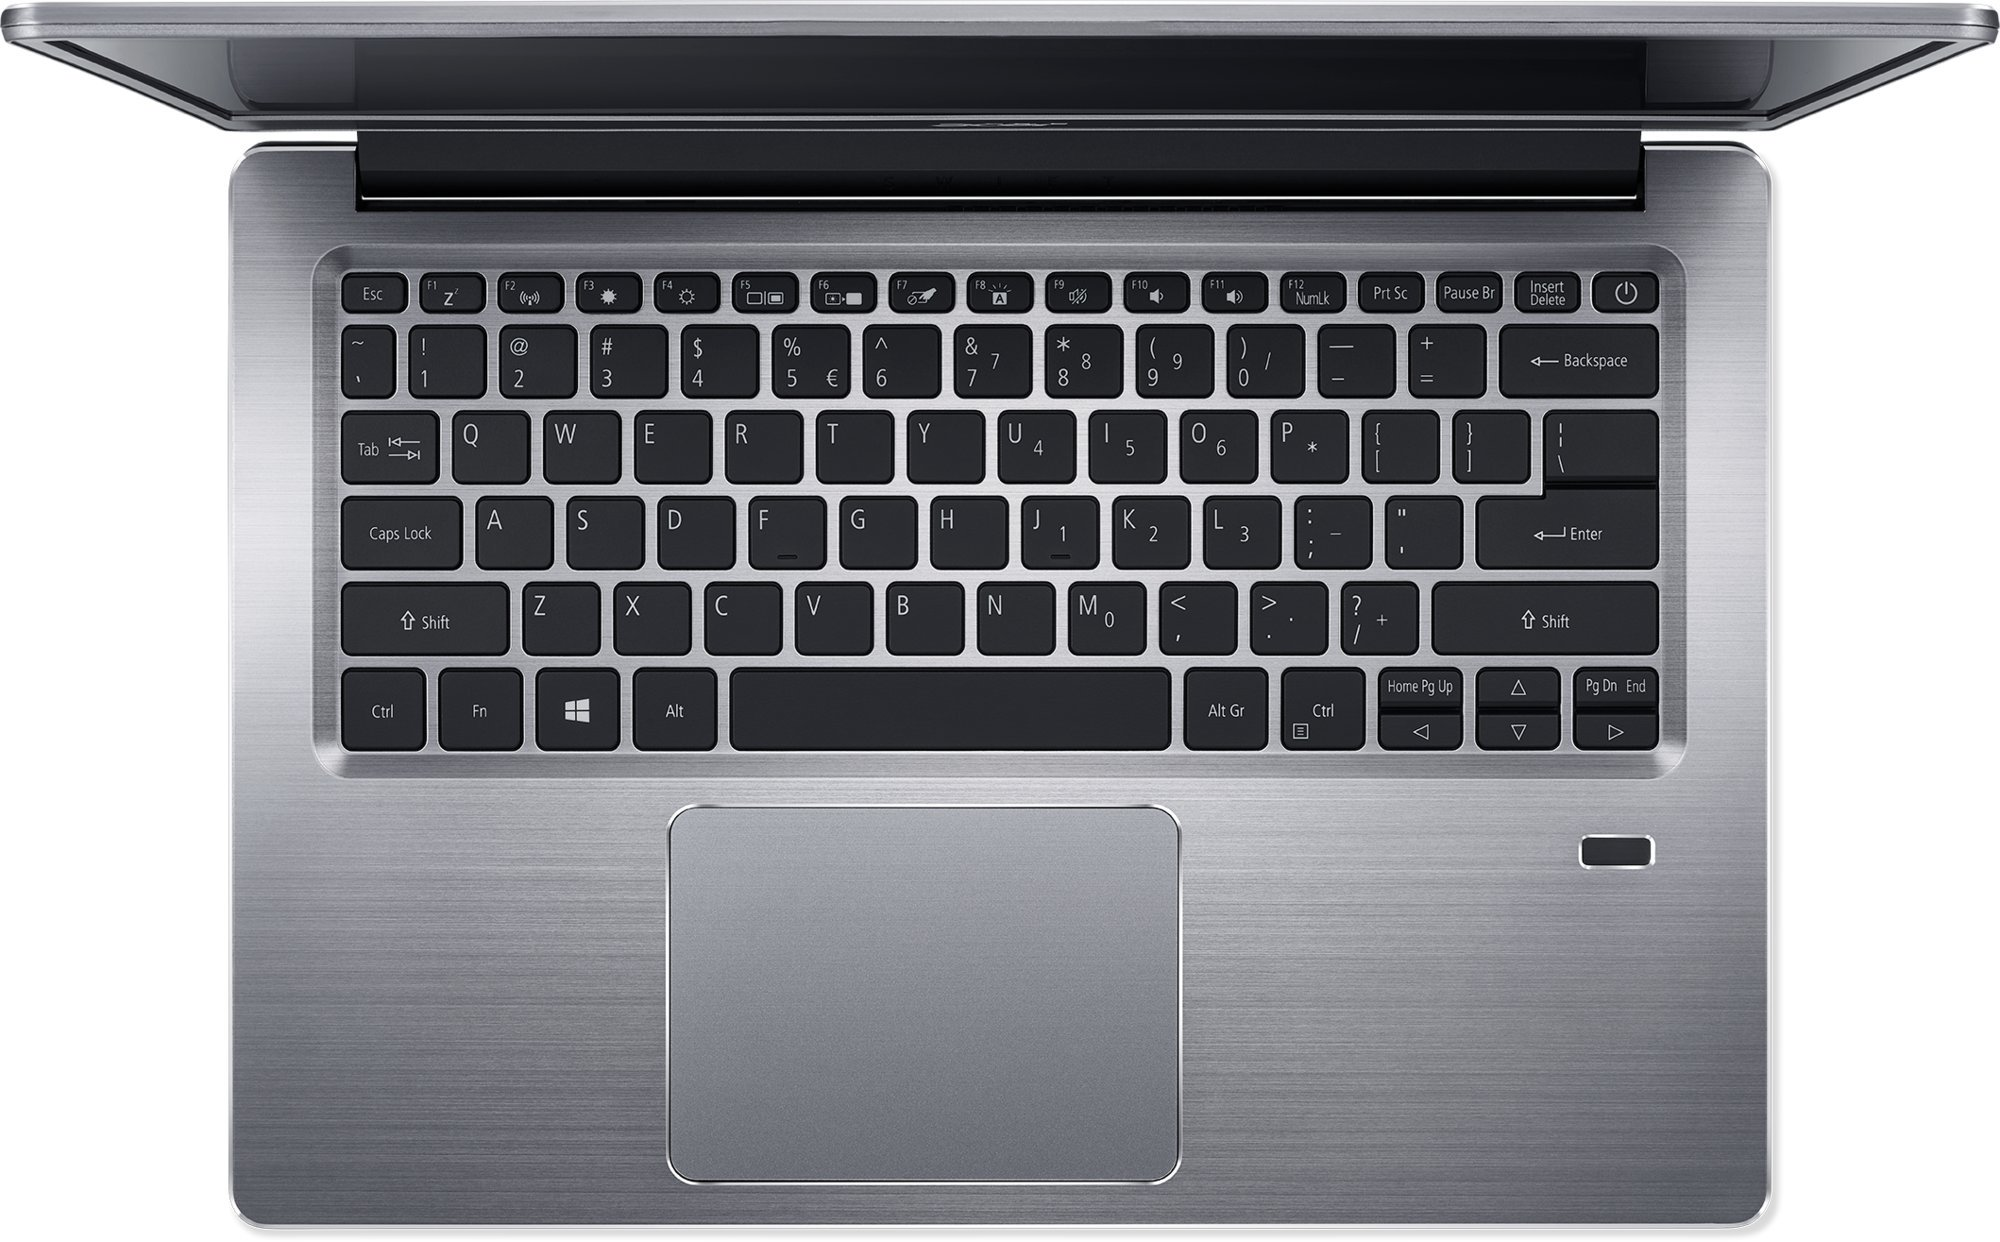 Acer Swift 3 SF314-55G-770U